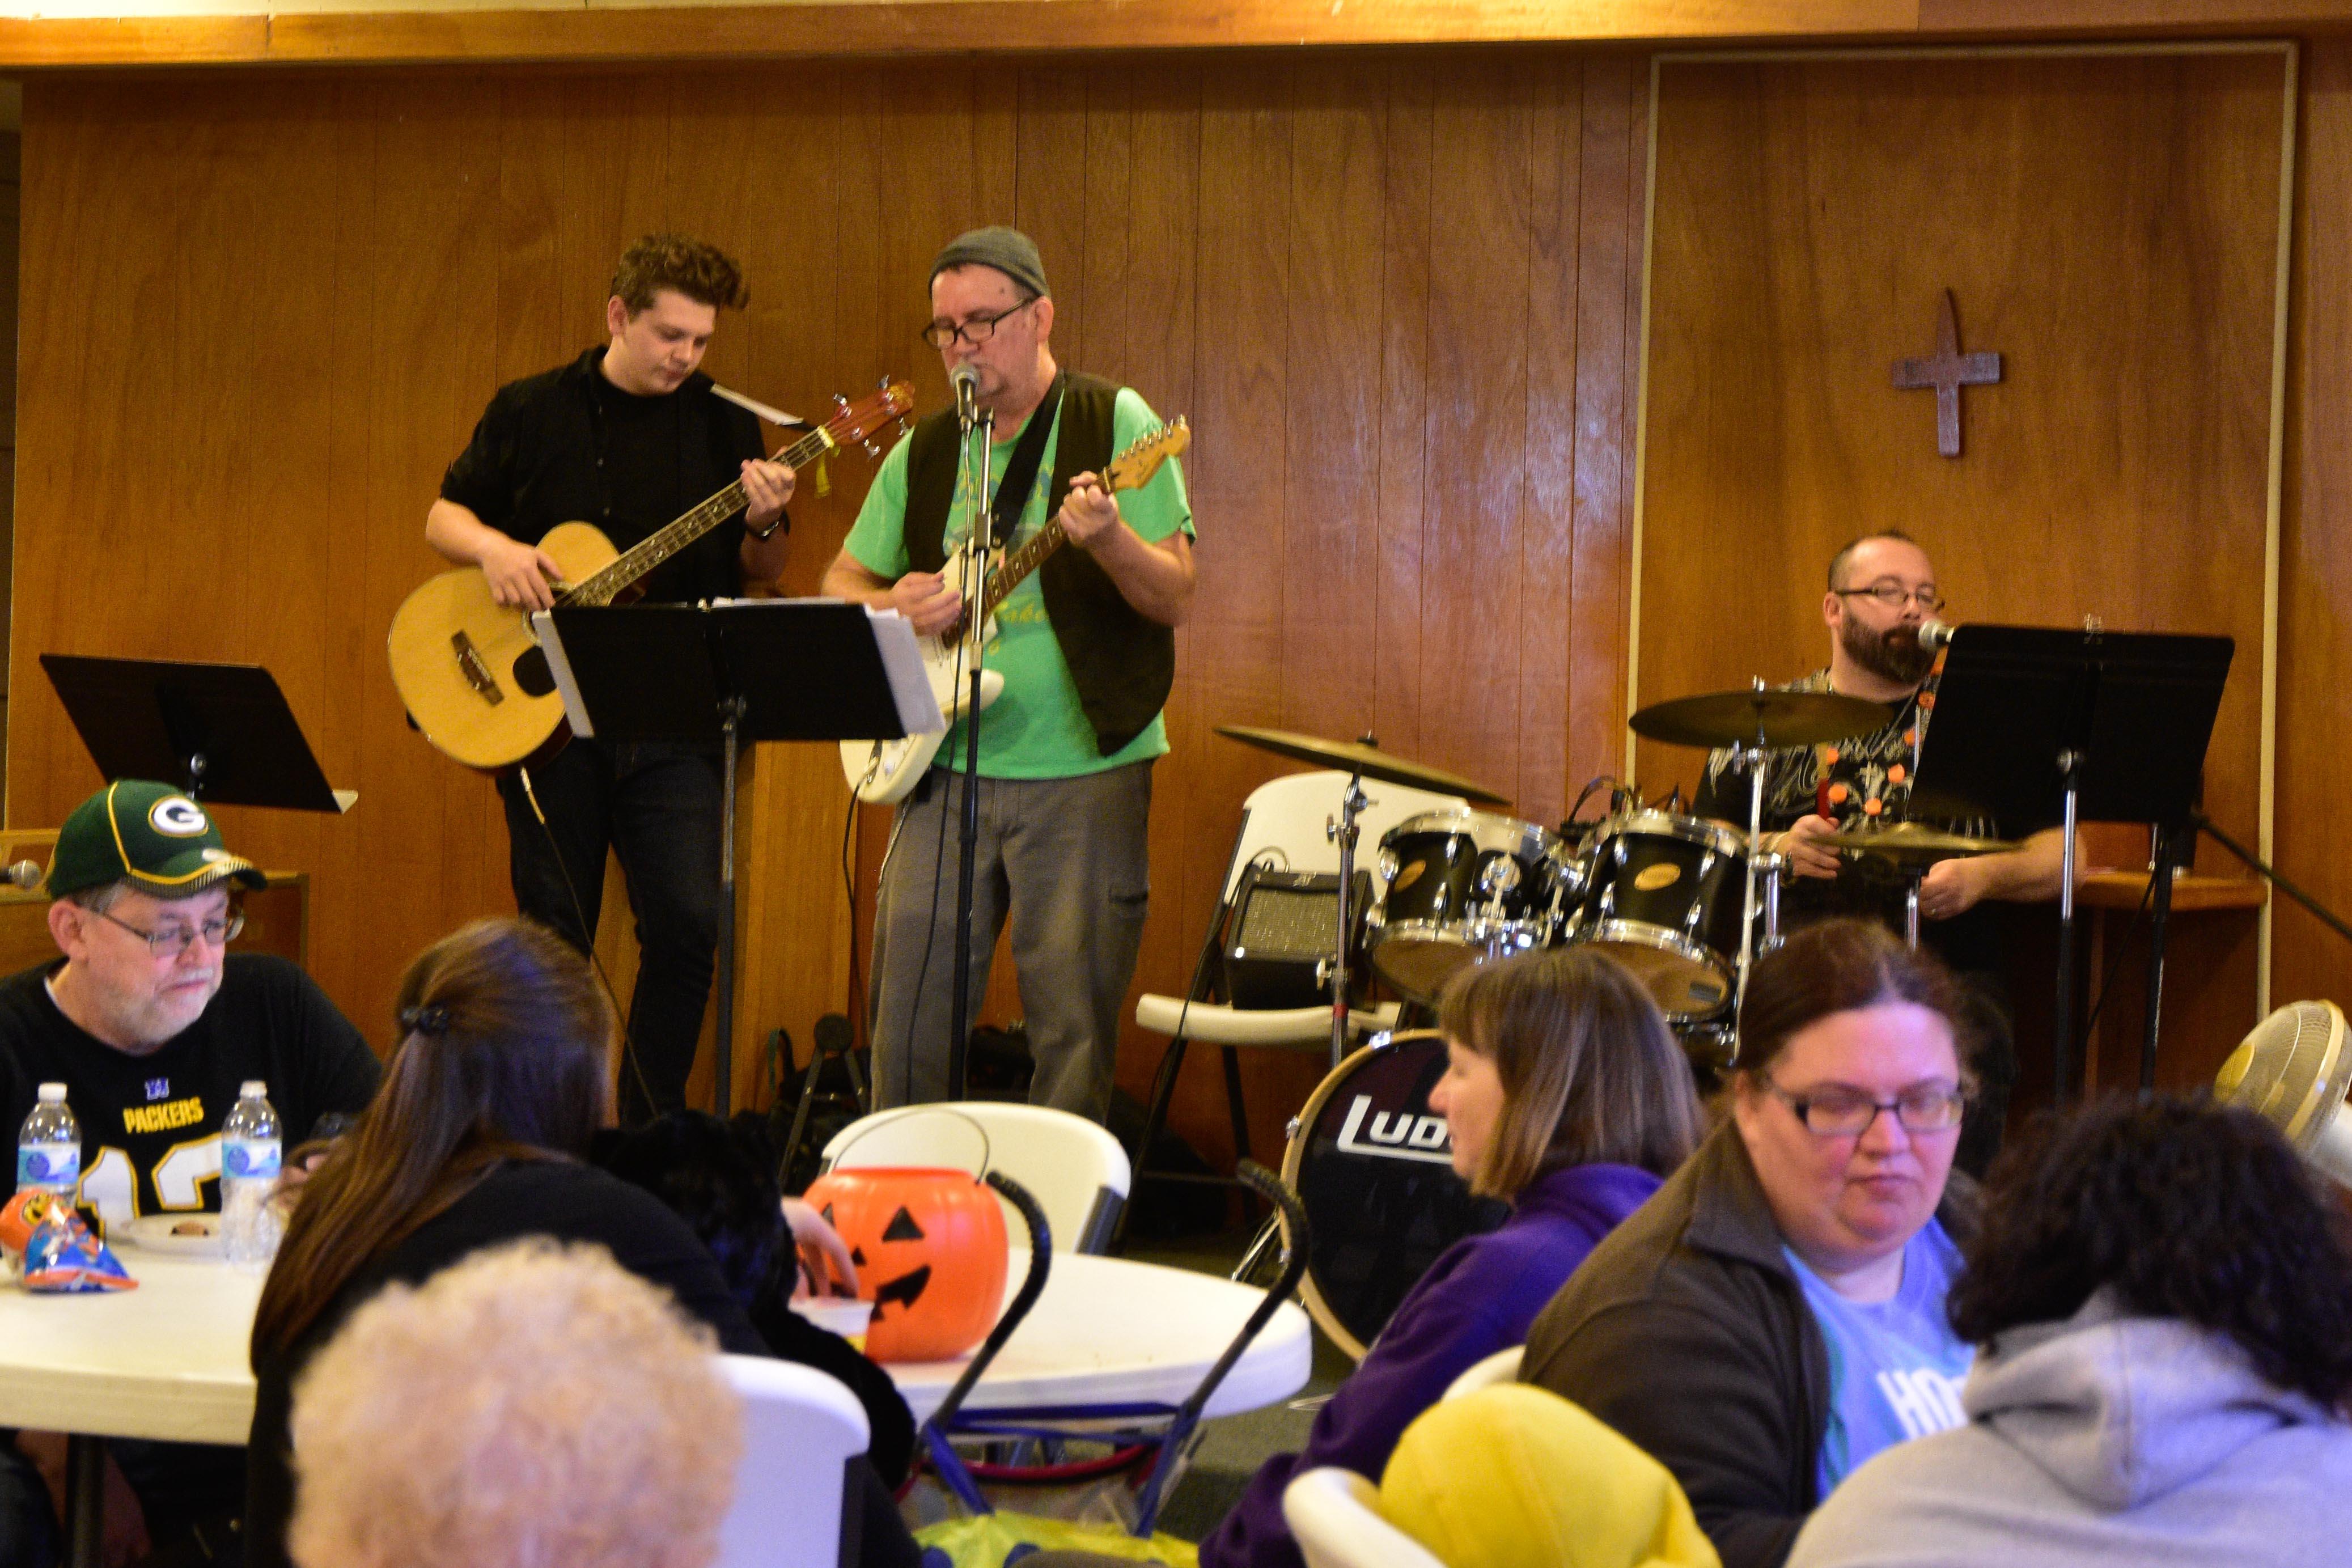 Overland Park Presbyterian Church, Fall Fest 2017, Music, get involved